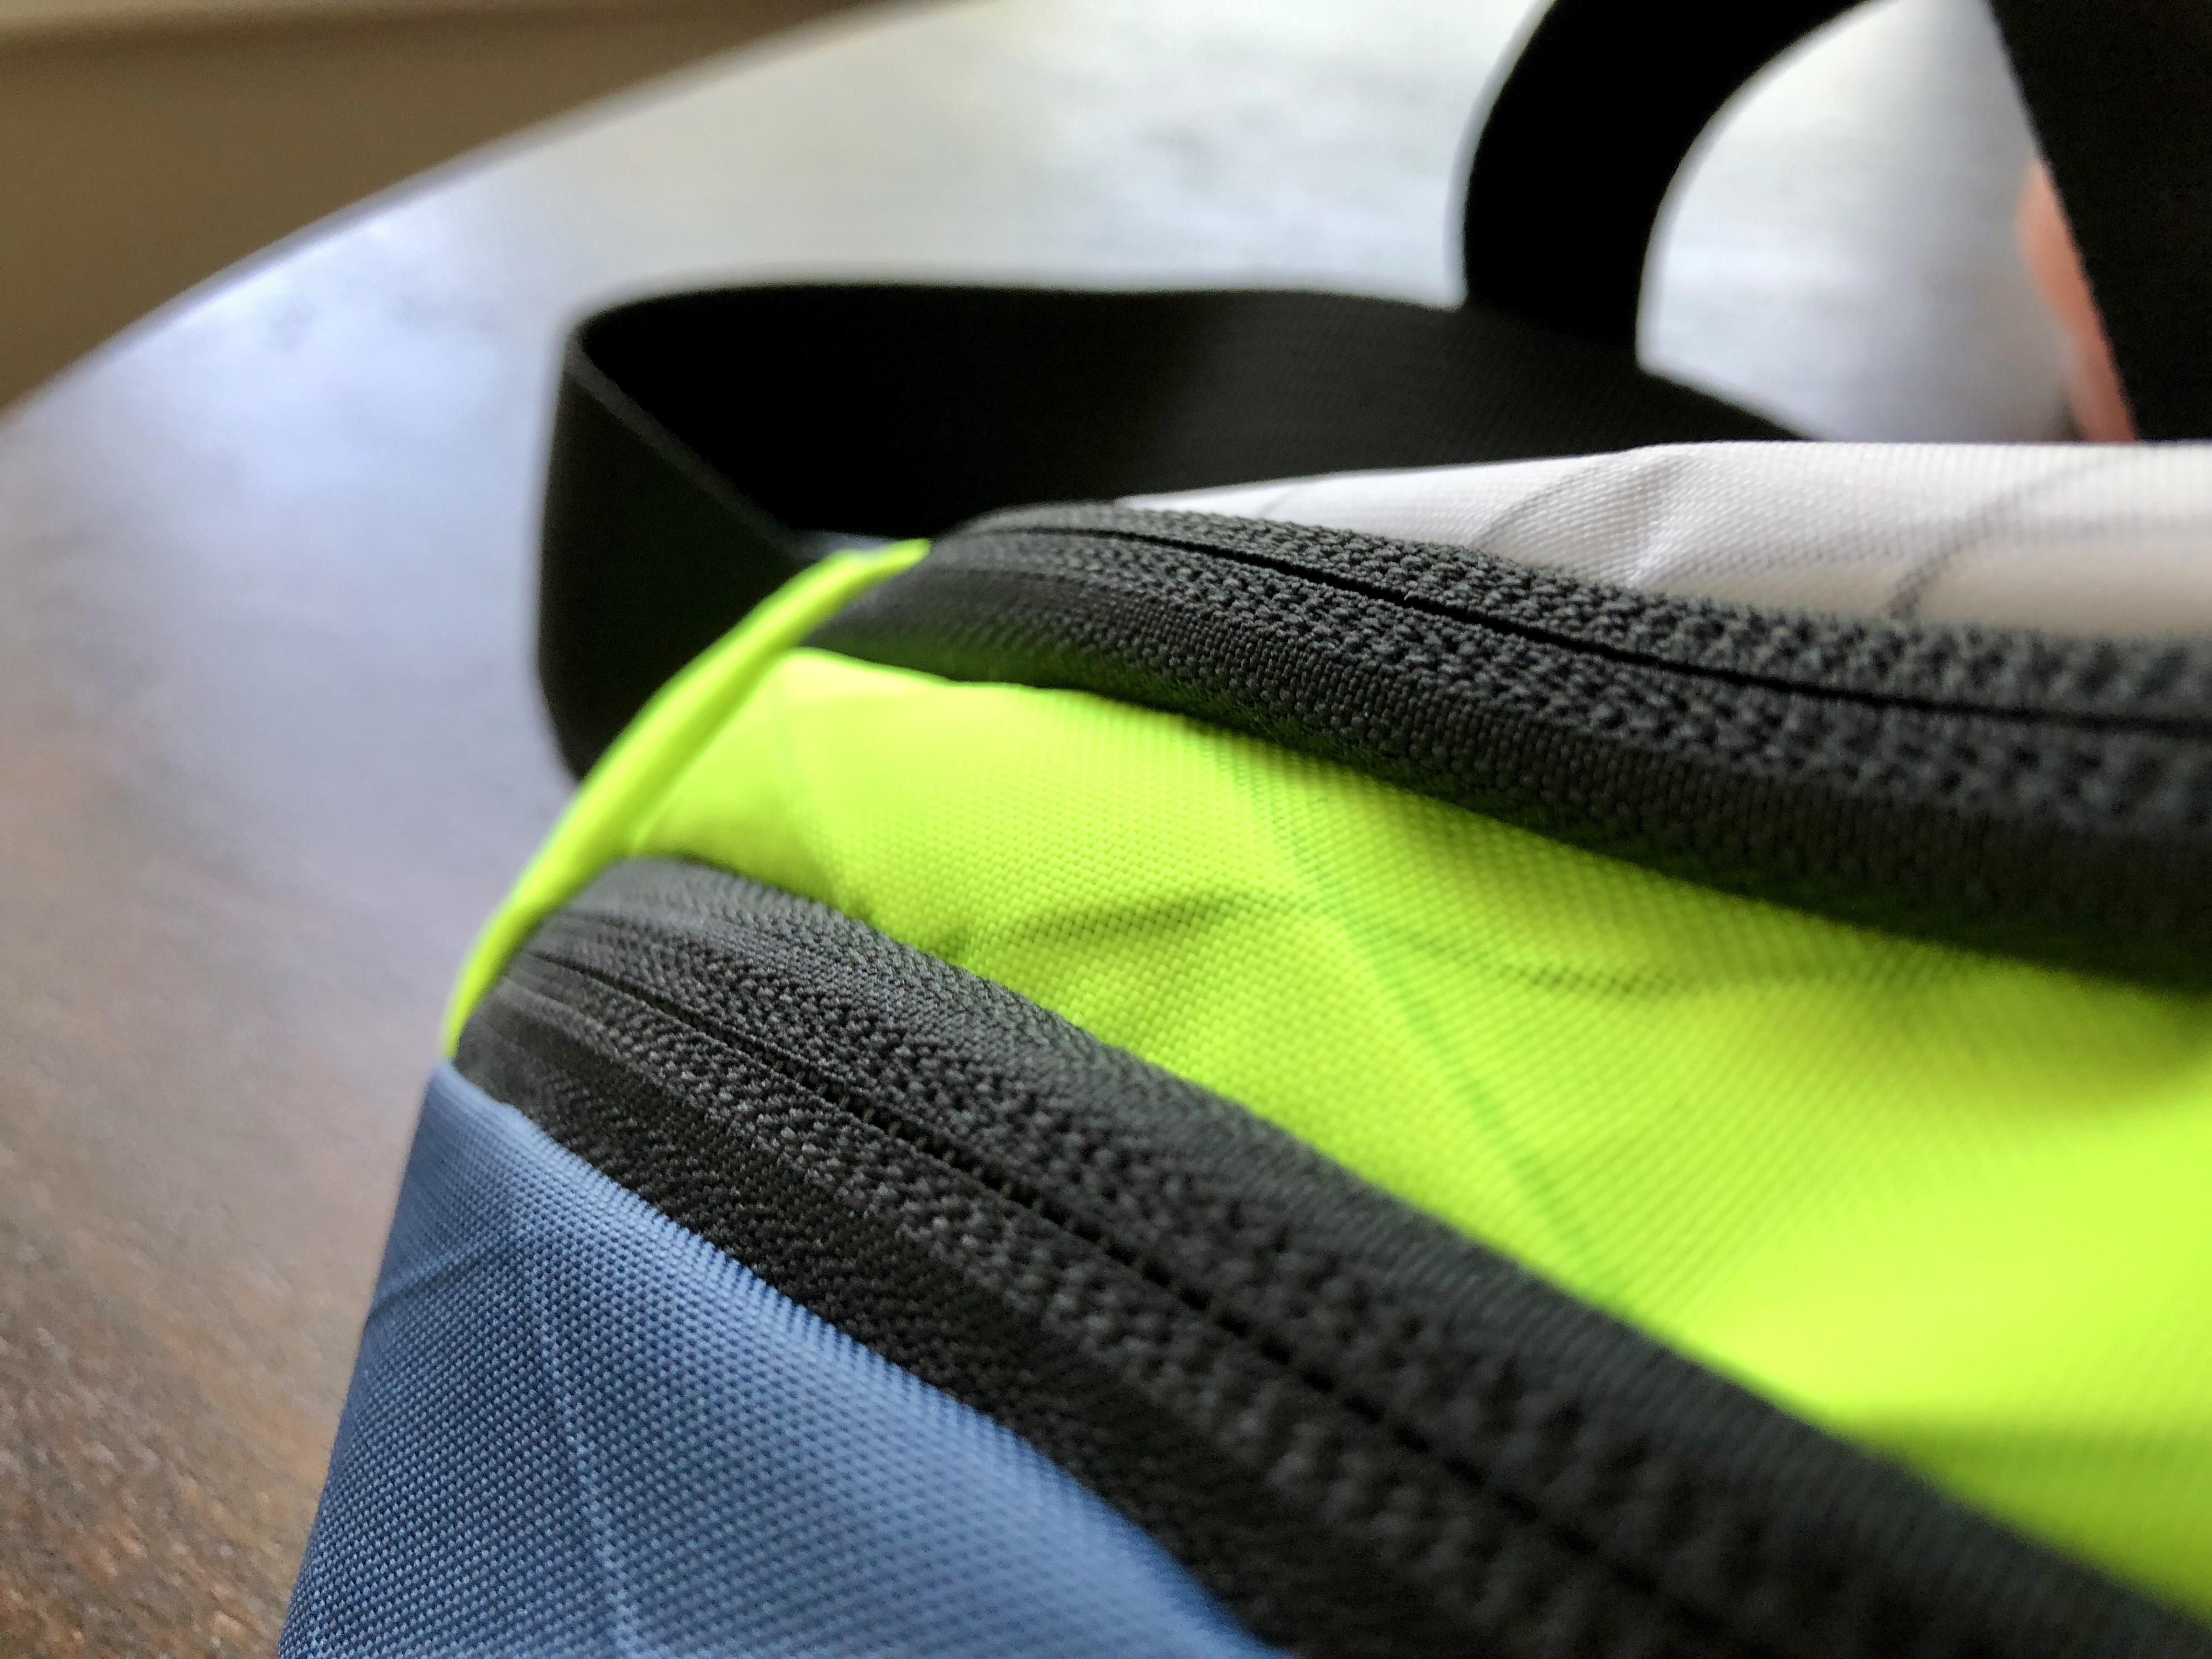 Flowfold Maverick zippers